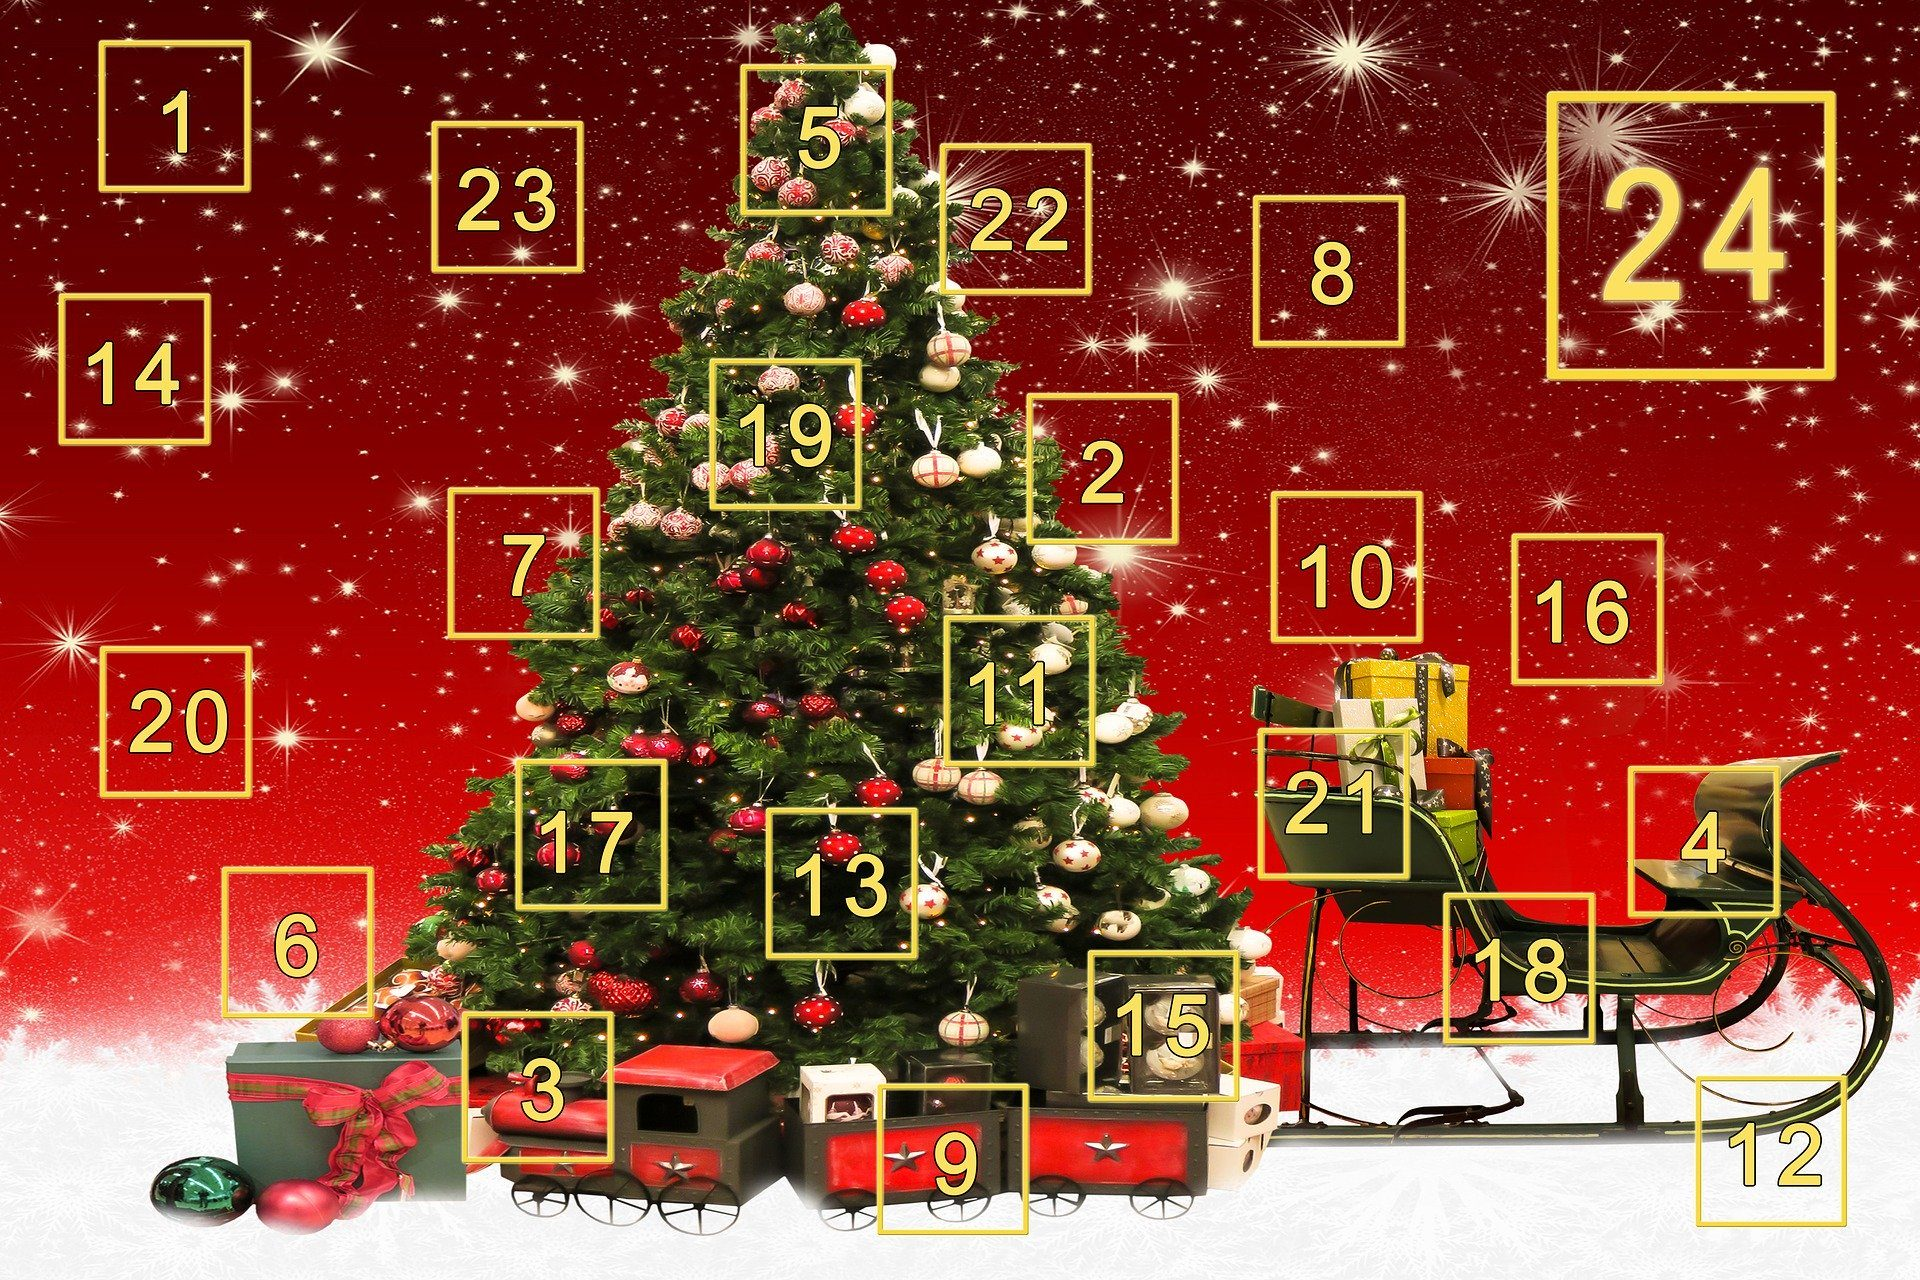 advent-calendar-2900406_1920.jpg